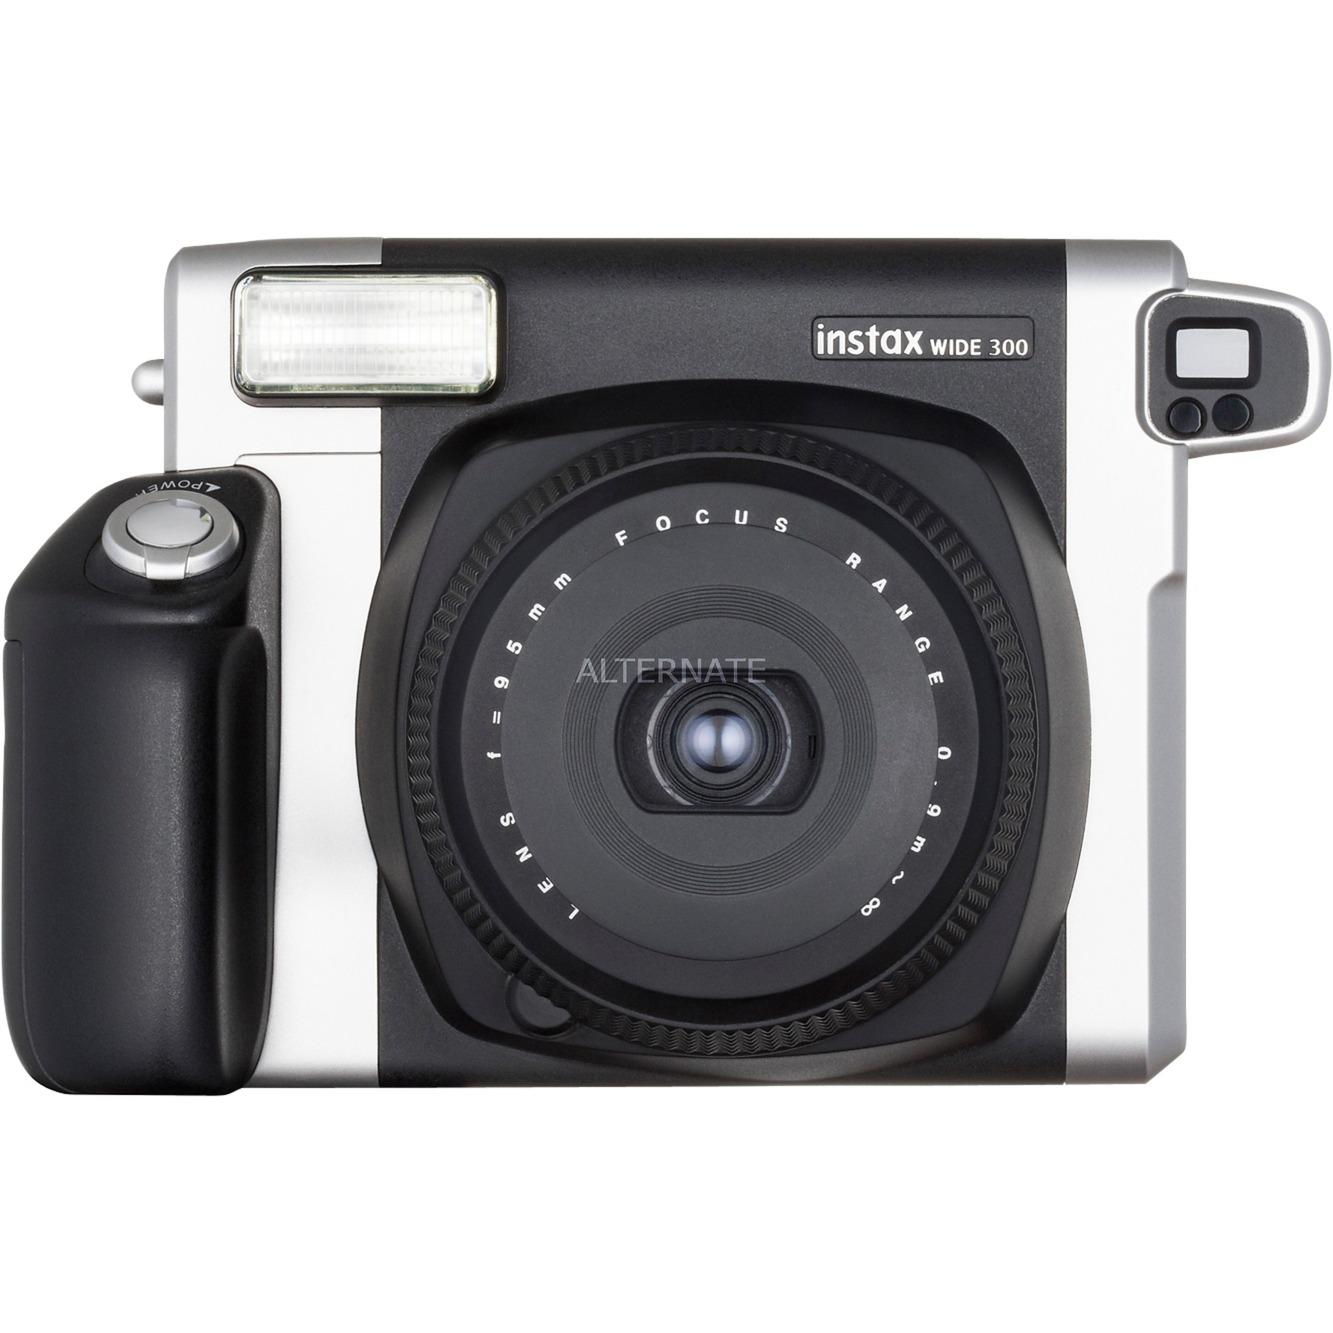 Instax Wide 300 cámara instantánea impresión 62 x 99 mm Negro, Plata